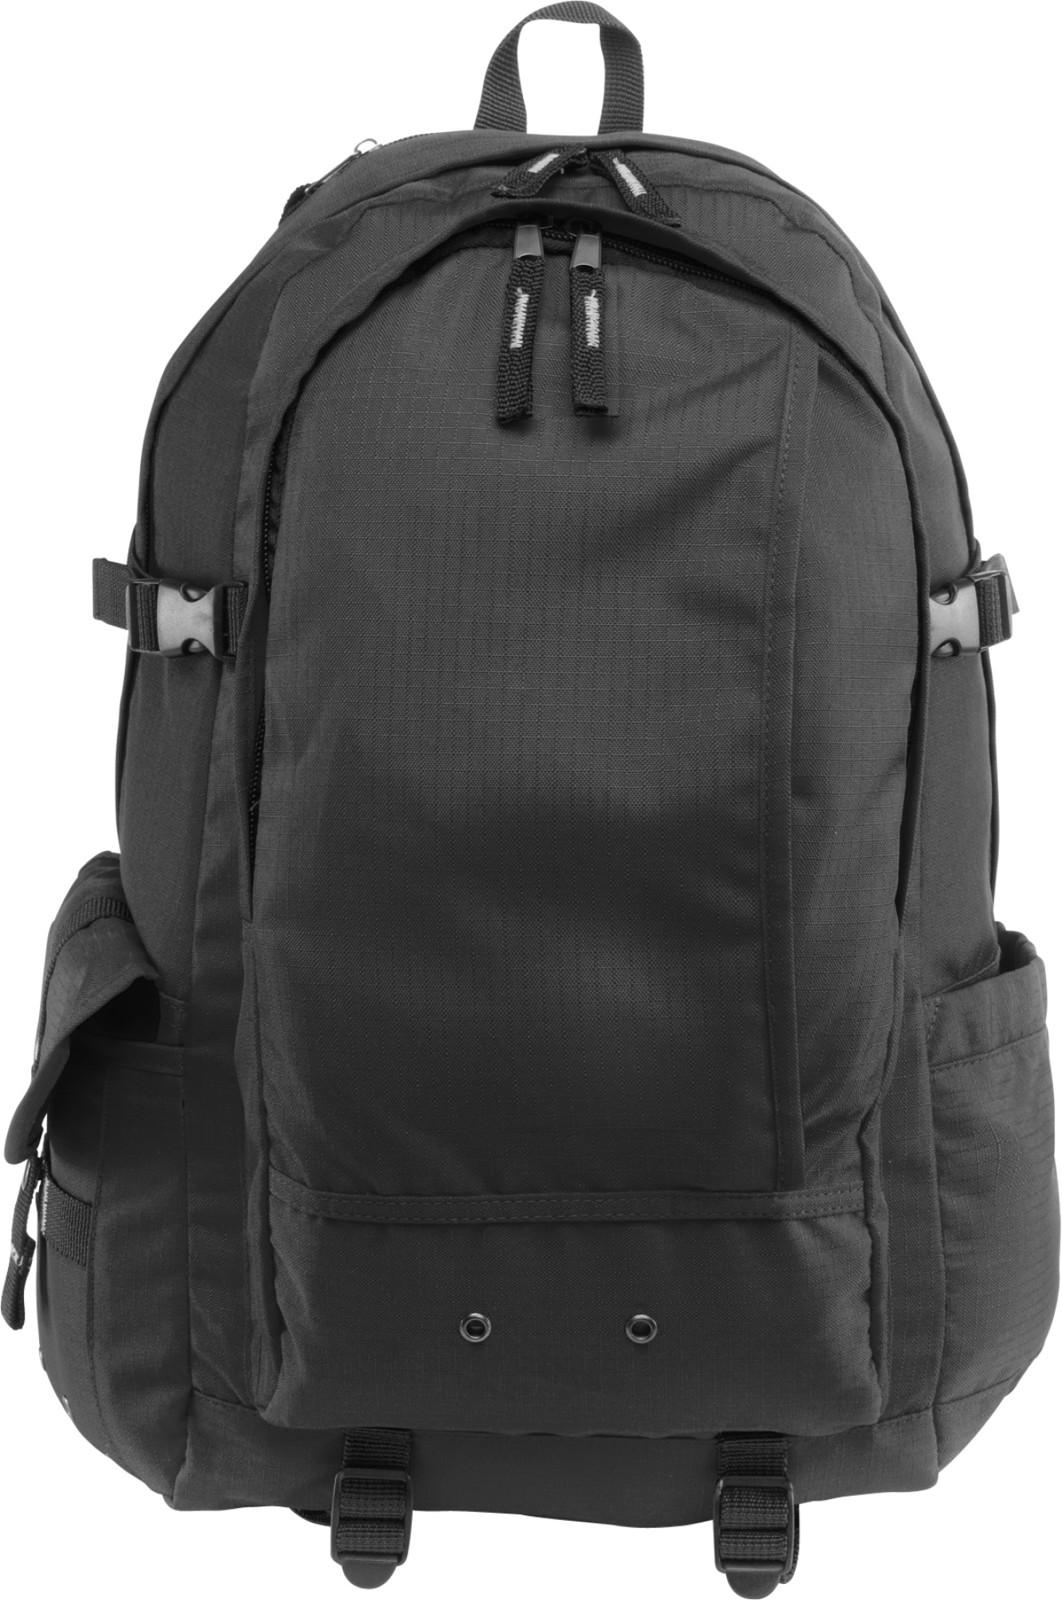 Ripstop (210D) backpack - Black